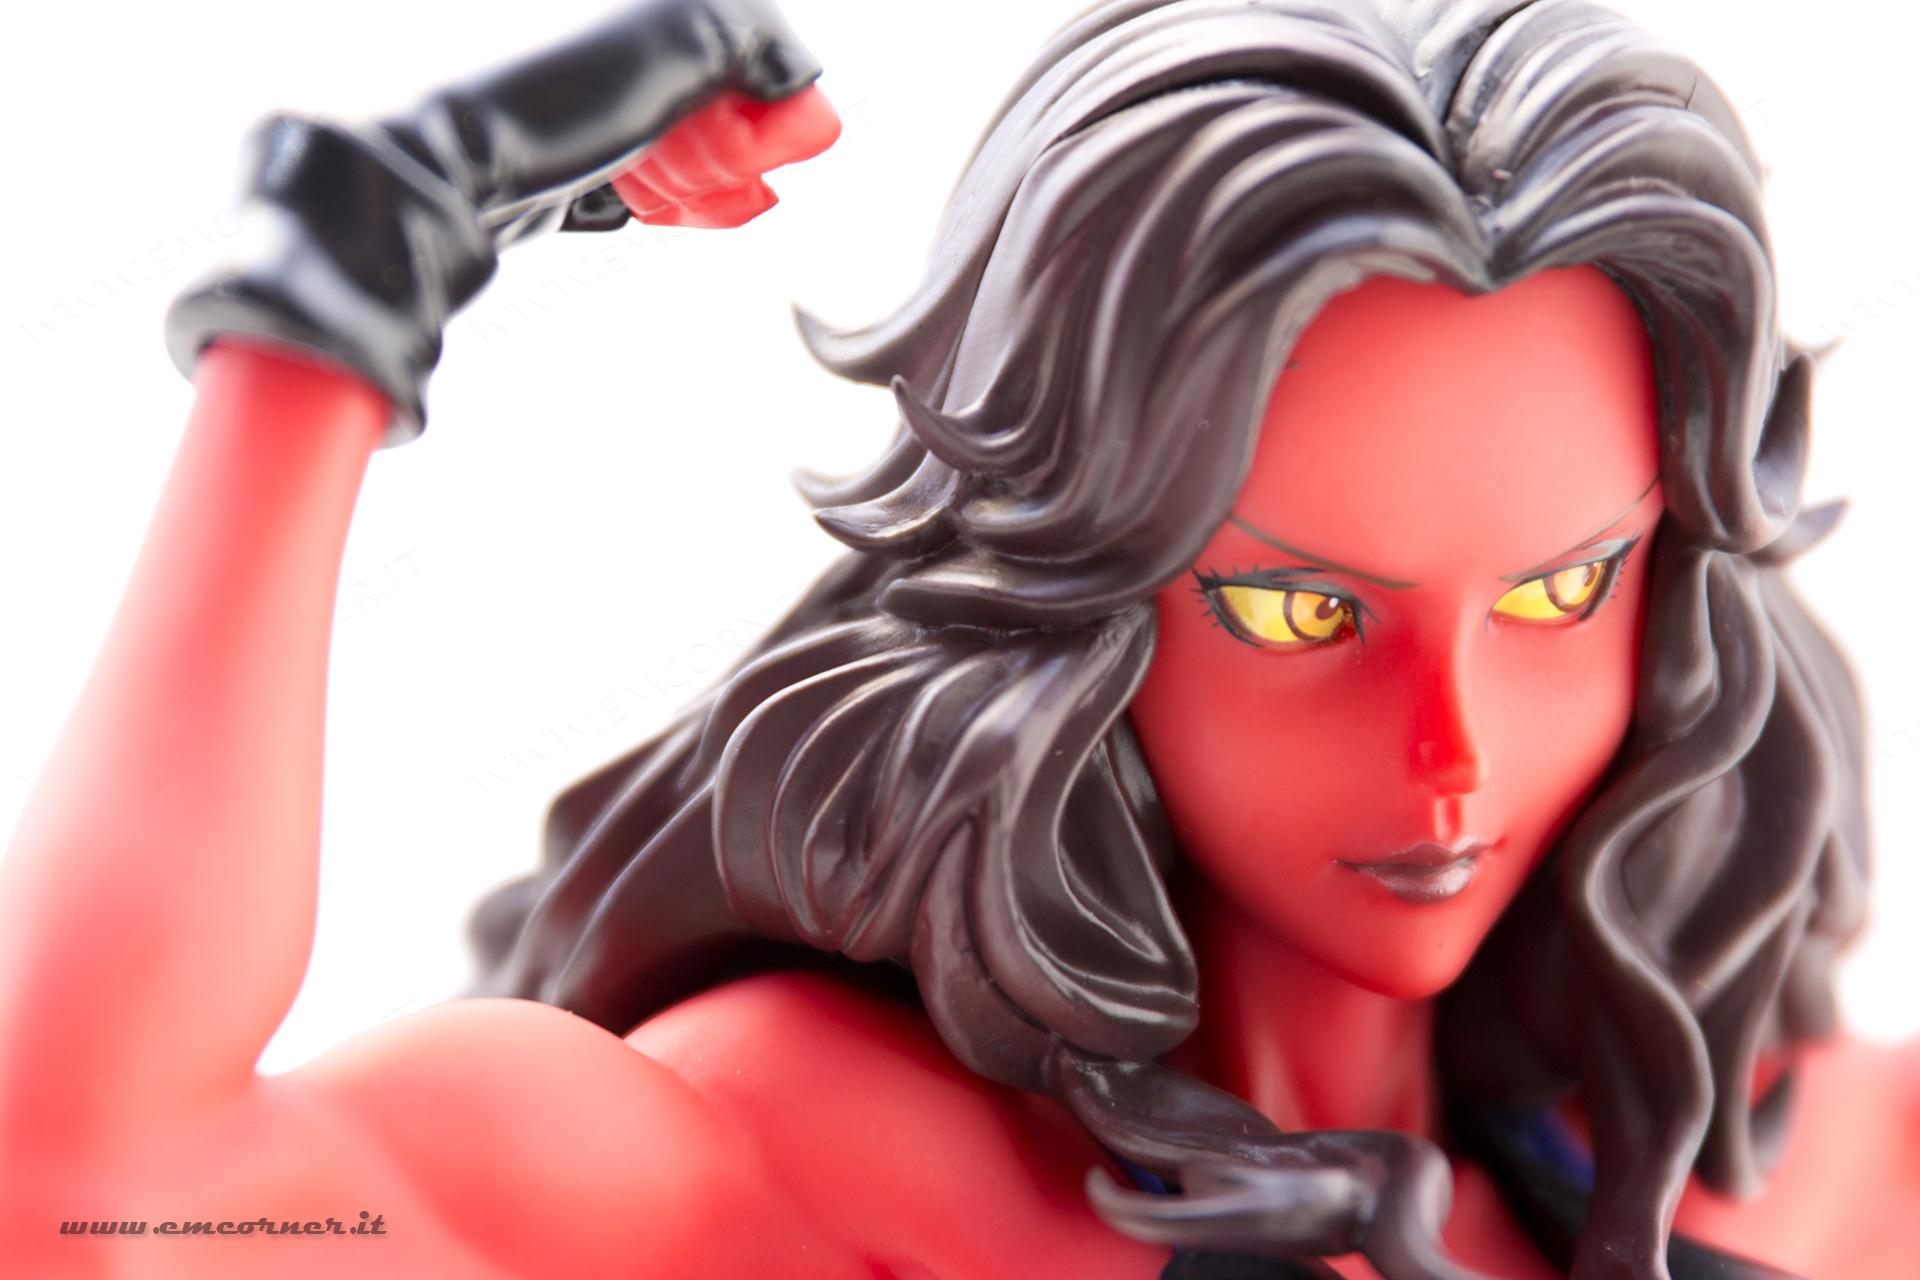 red_she_hul_kotobukiya_bishoujo_emcorner-it_-20